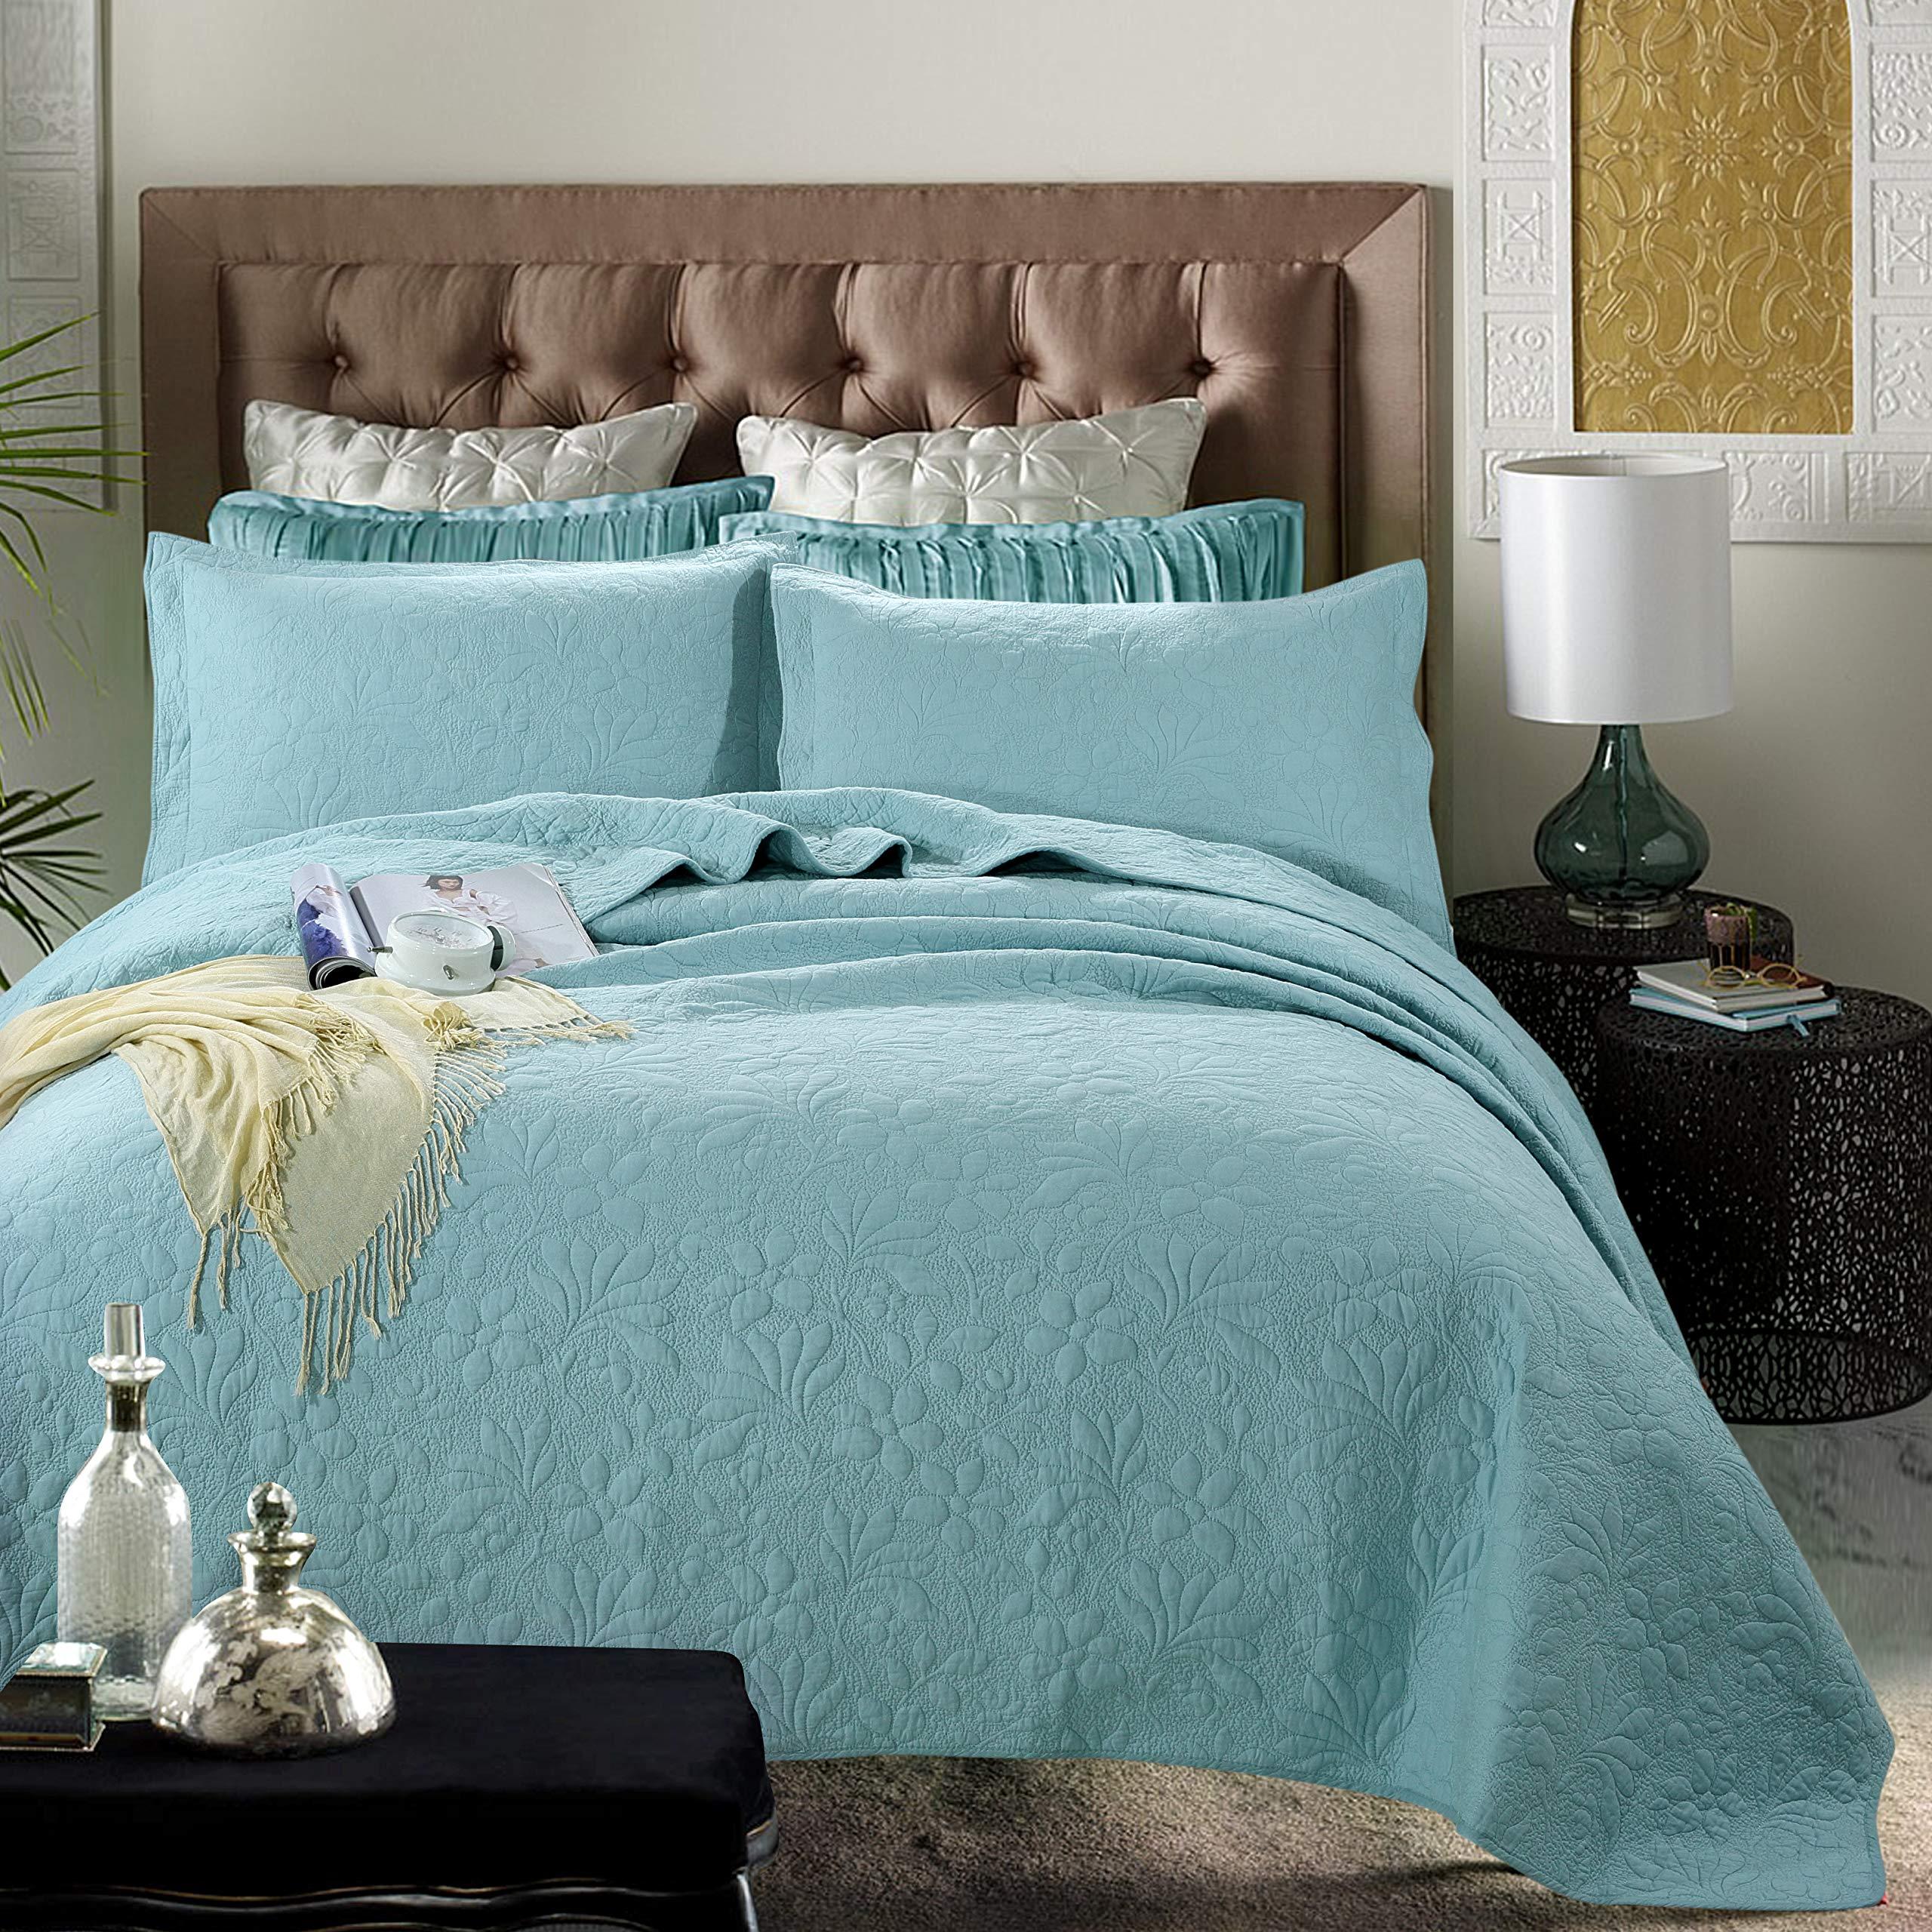 WINLIFE 3-Pieces Lightweight Bedspread for Summer Queen Size Orchid Print Matelasse Bedspread Coverlet Set (Queen, Turquoise)